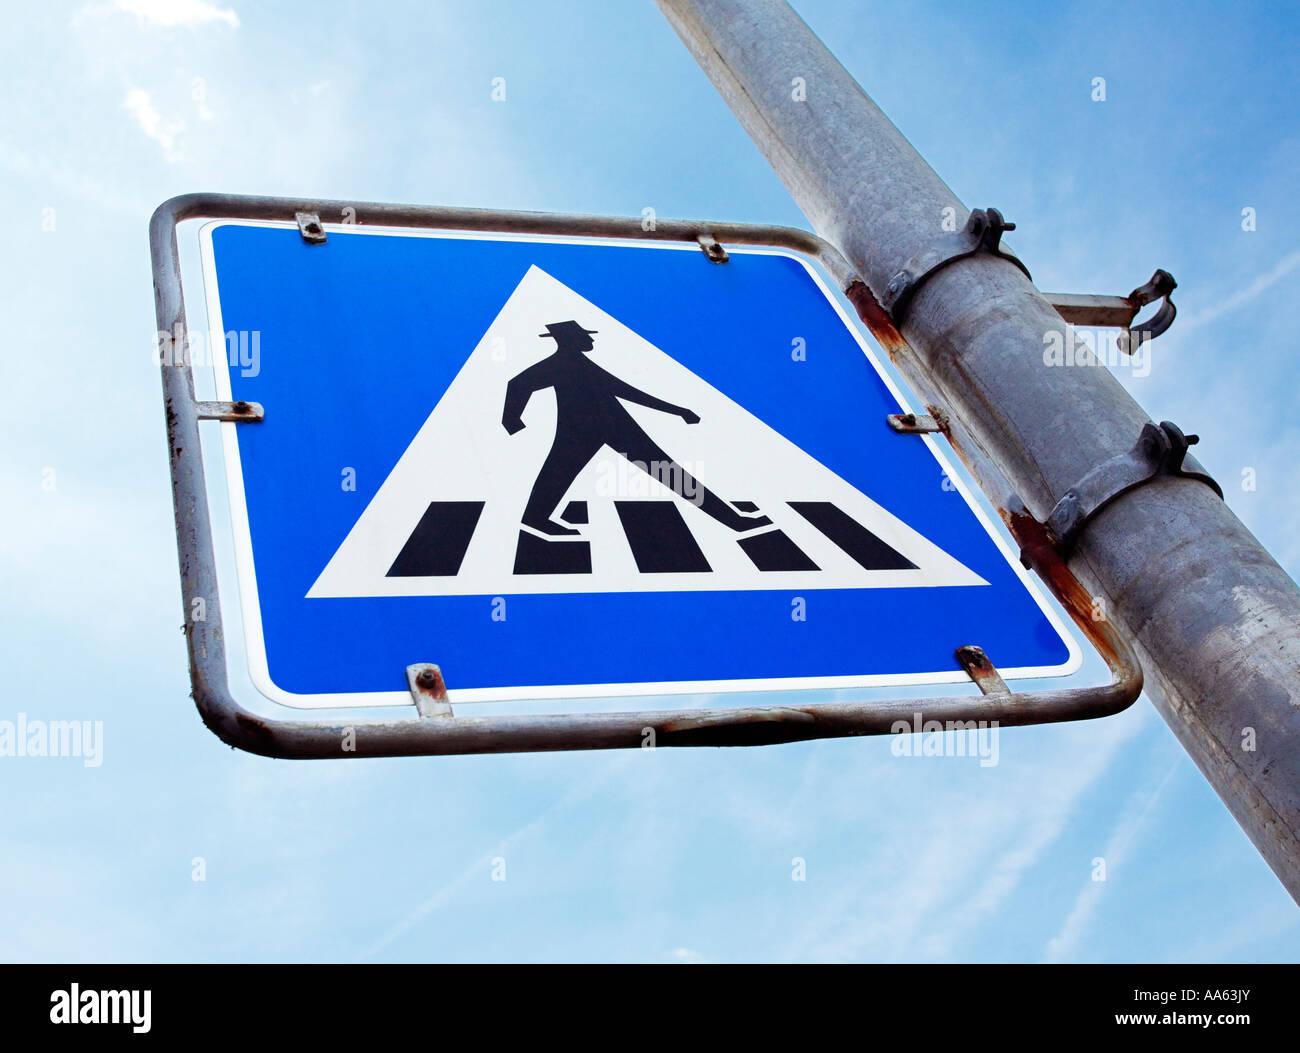 German pedestrian crossing sign, Germany, Europe - Stock Image